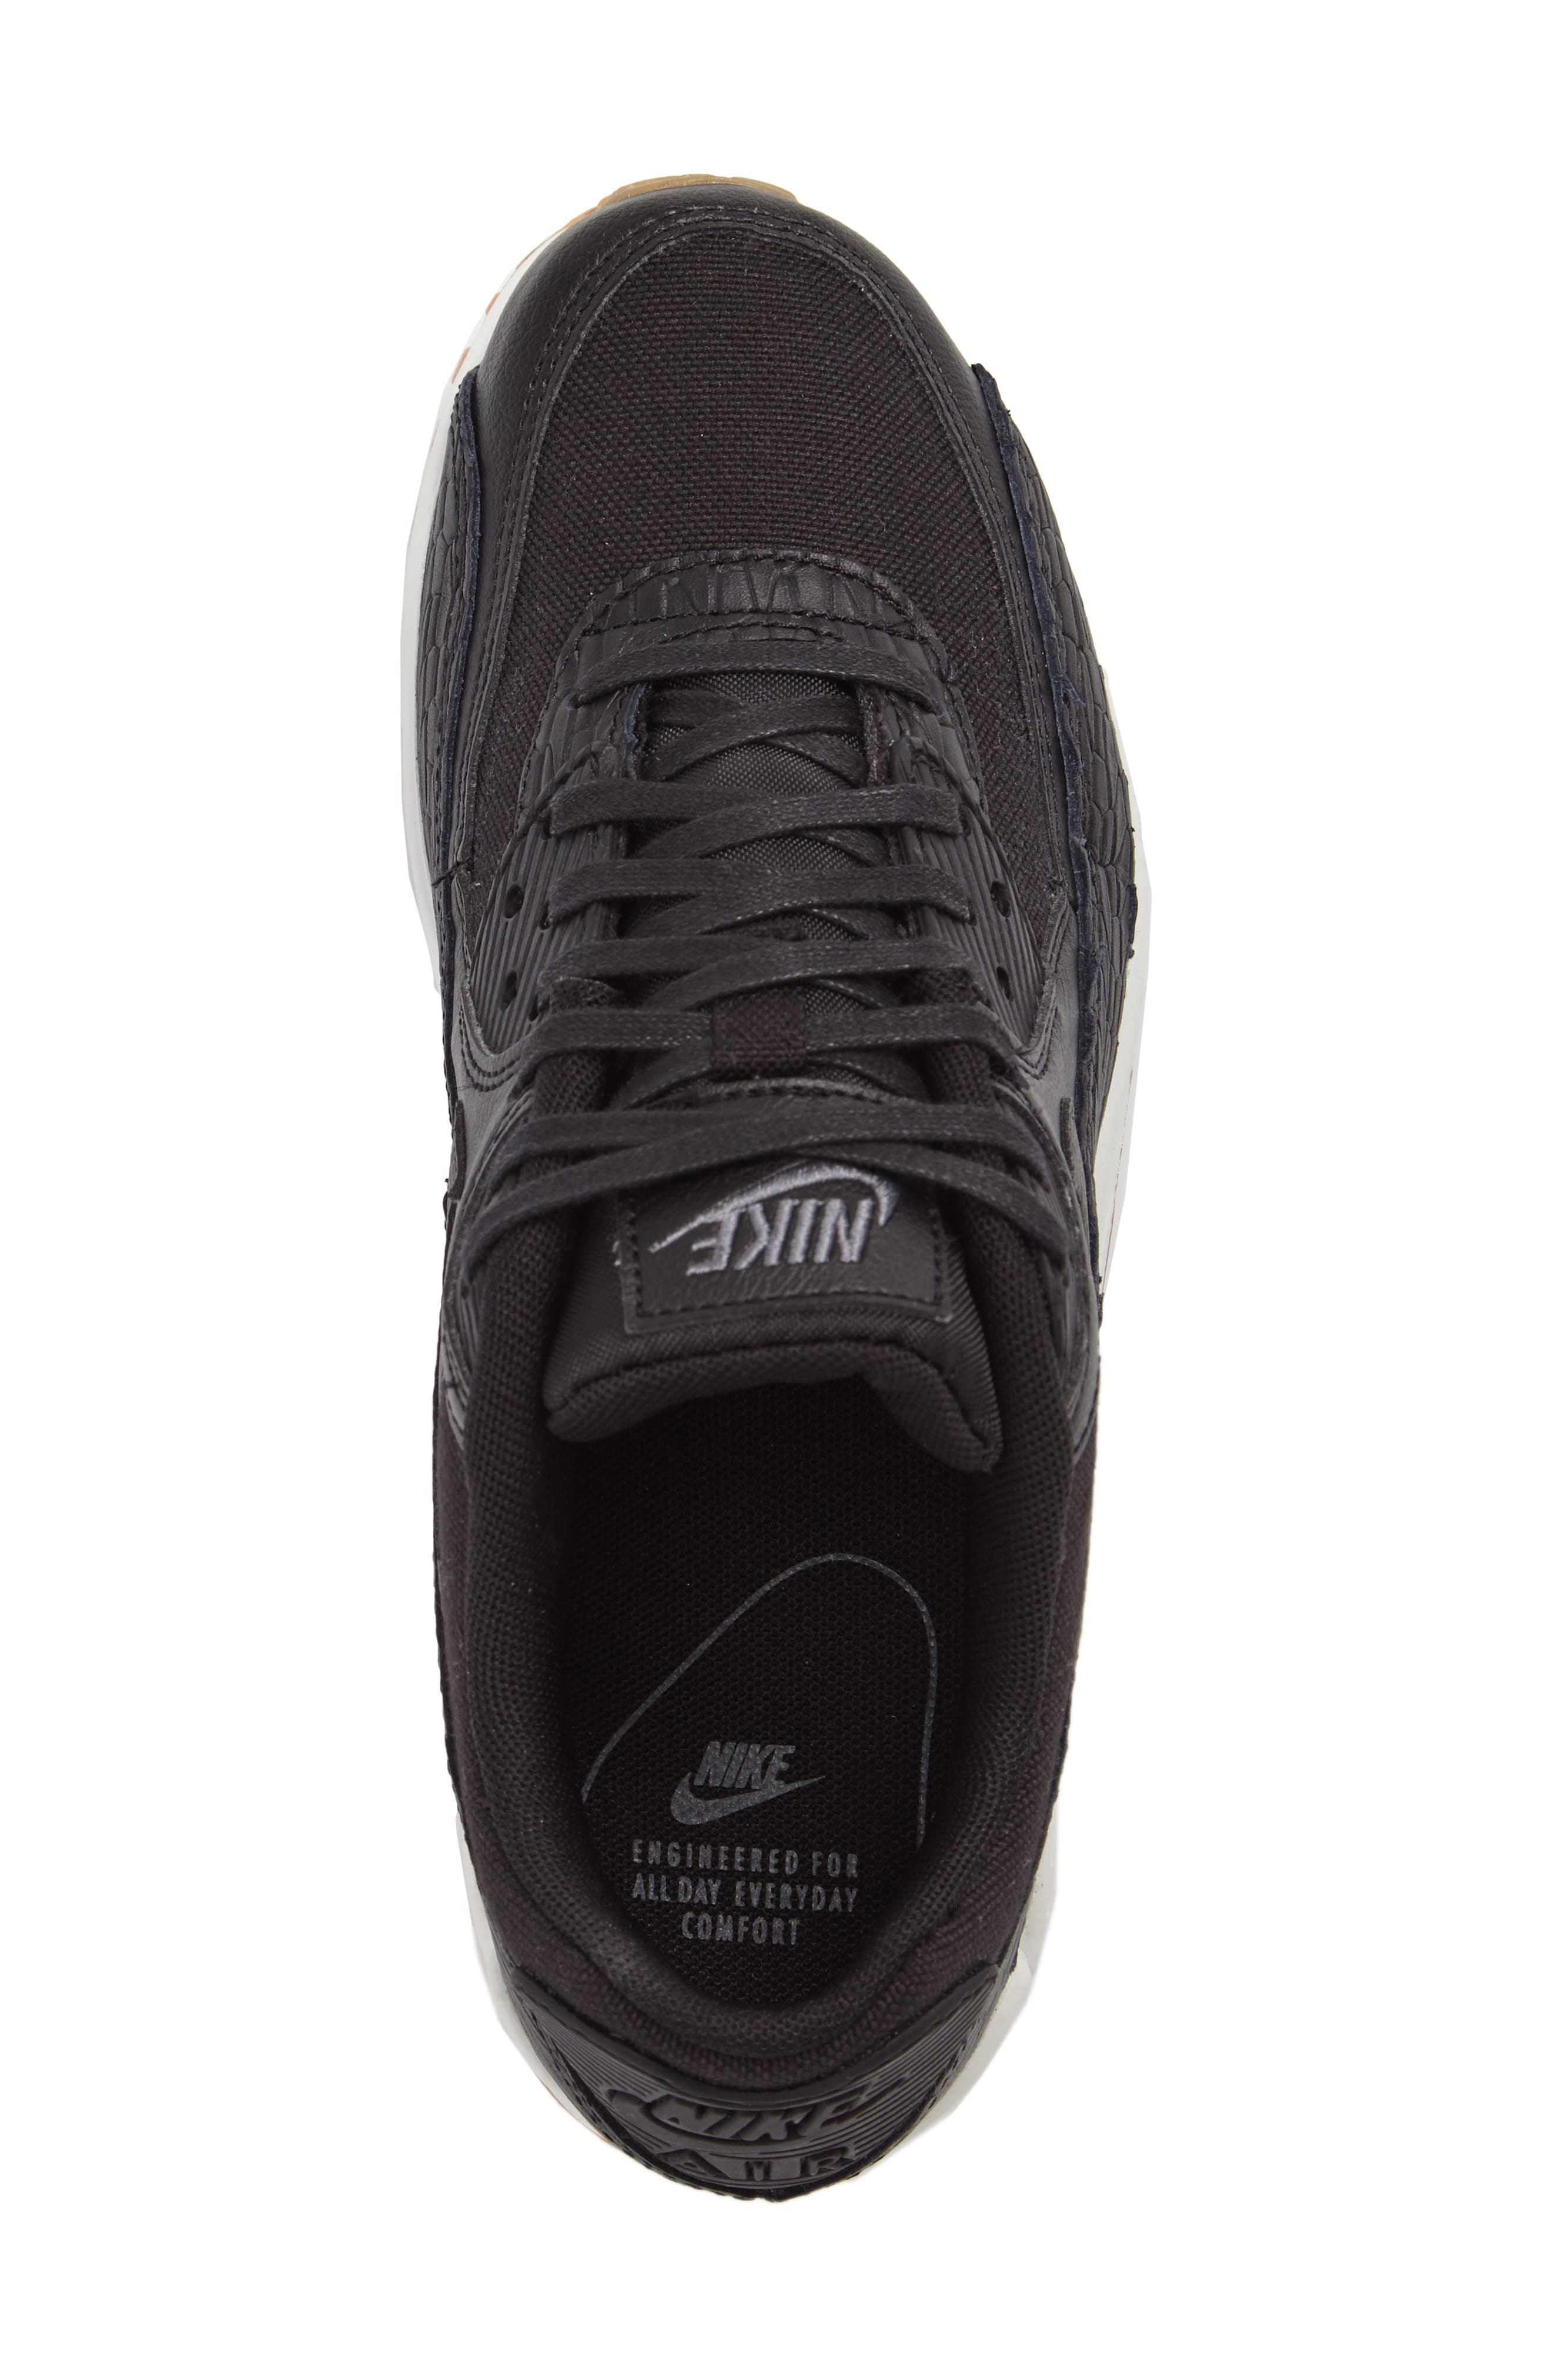 Air Max 90 Premium Leather Sneaker,                             Alternate thumbnail 5, color,                             Black/ Dark Grey/ Ivory